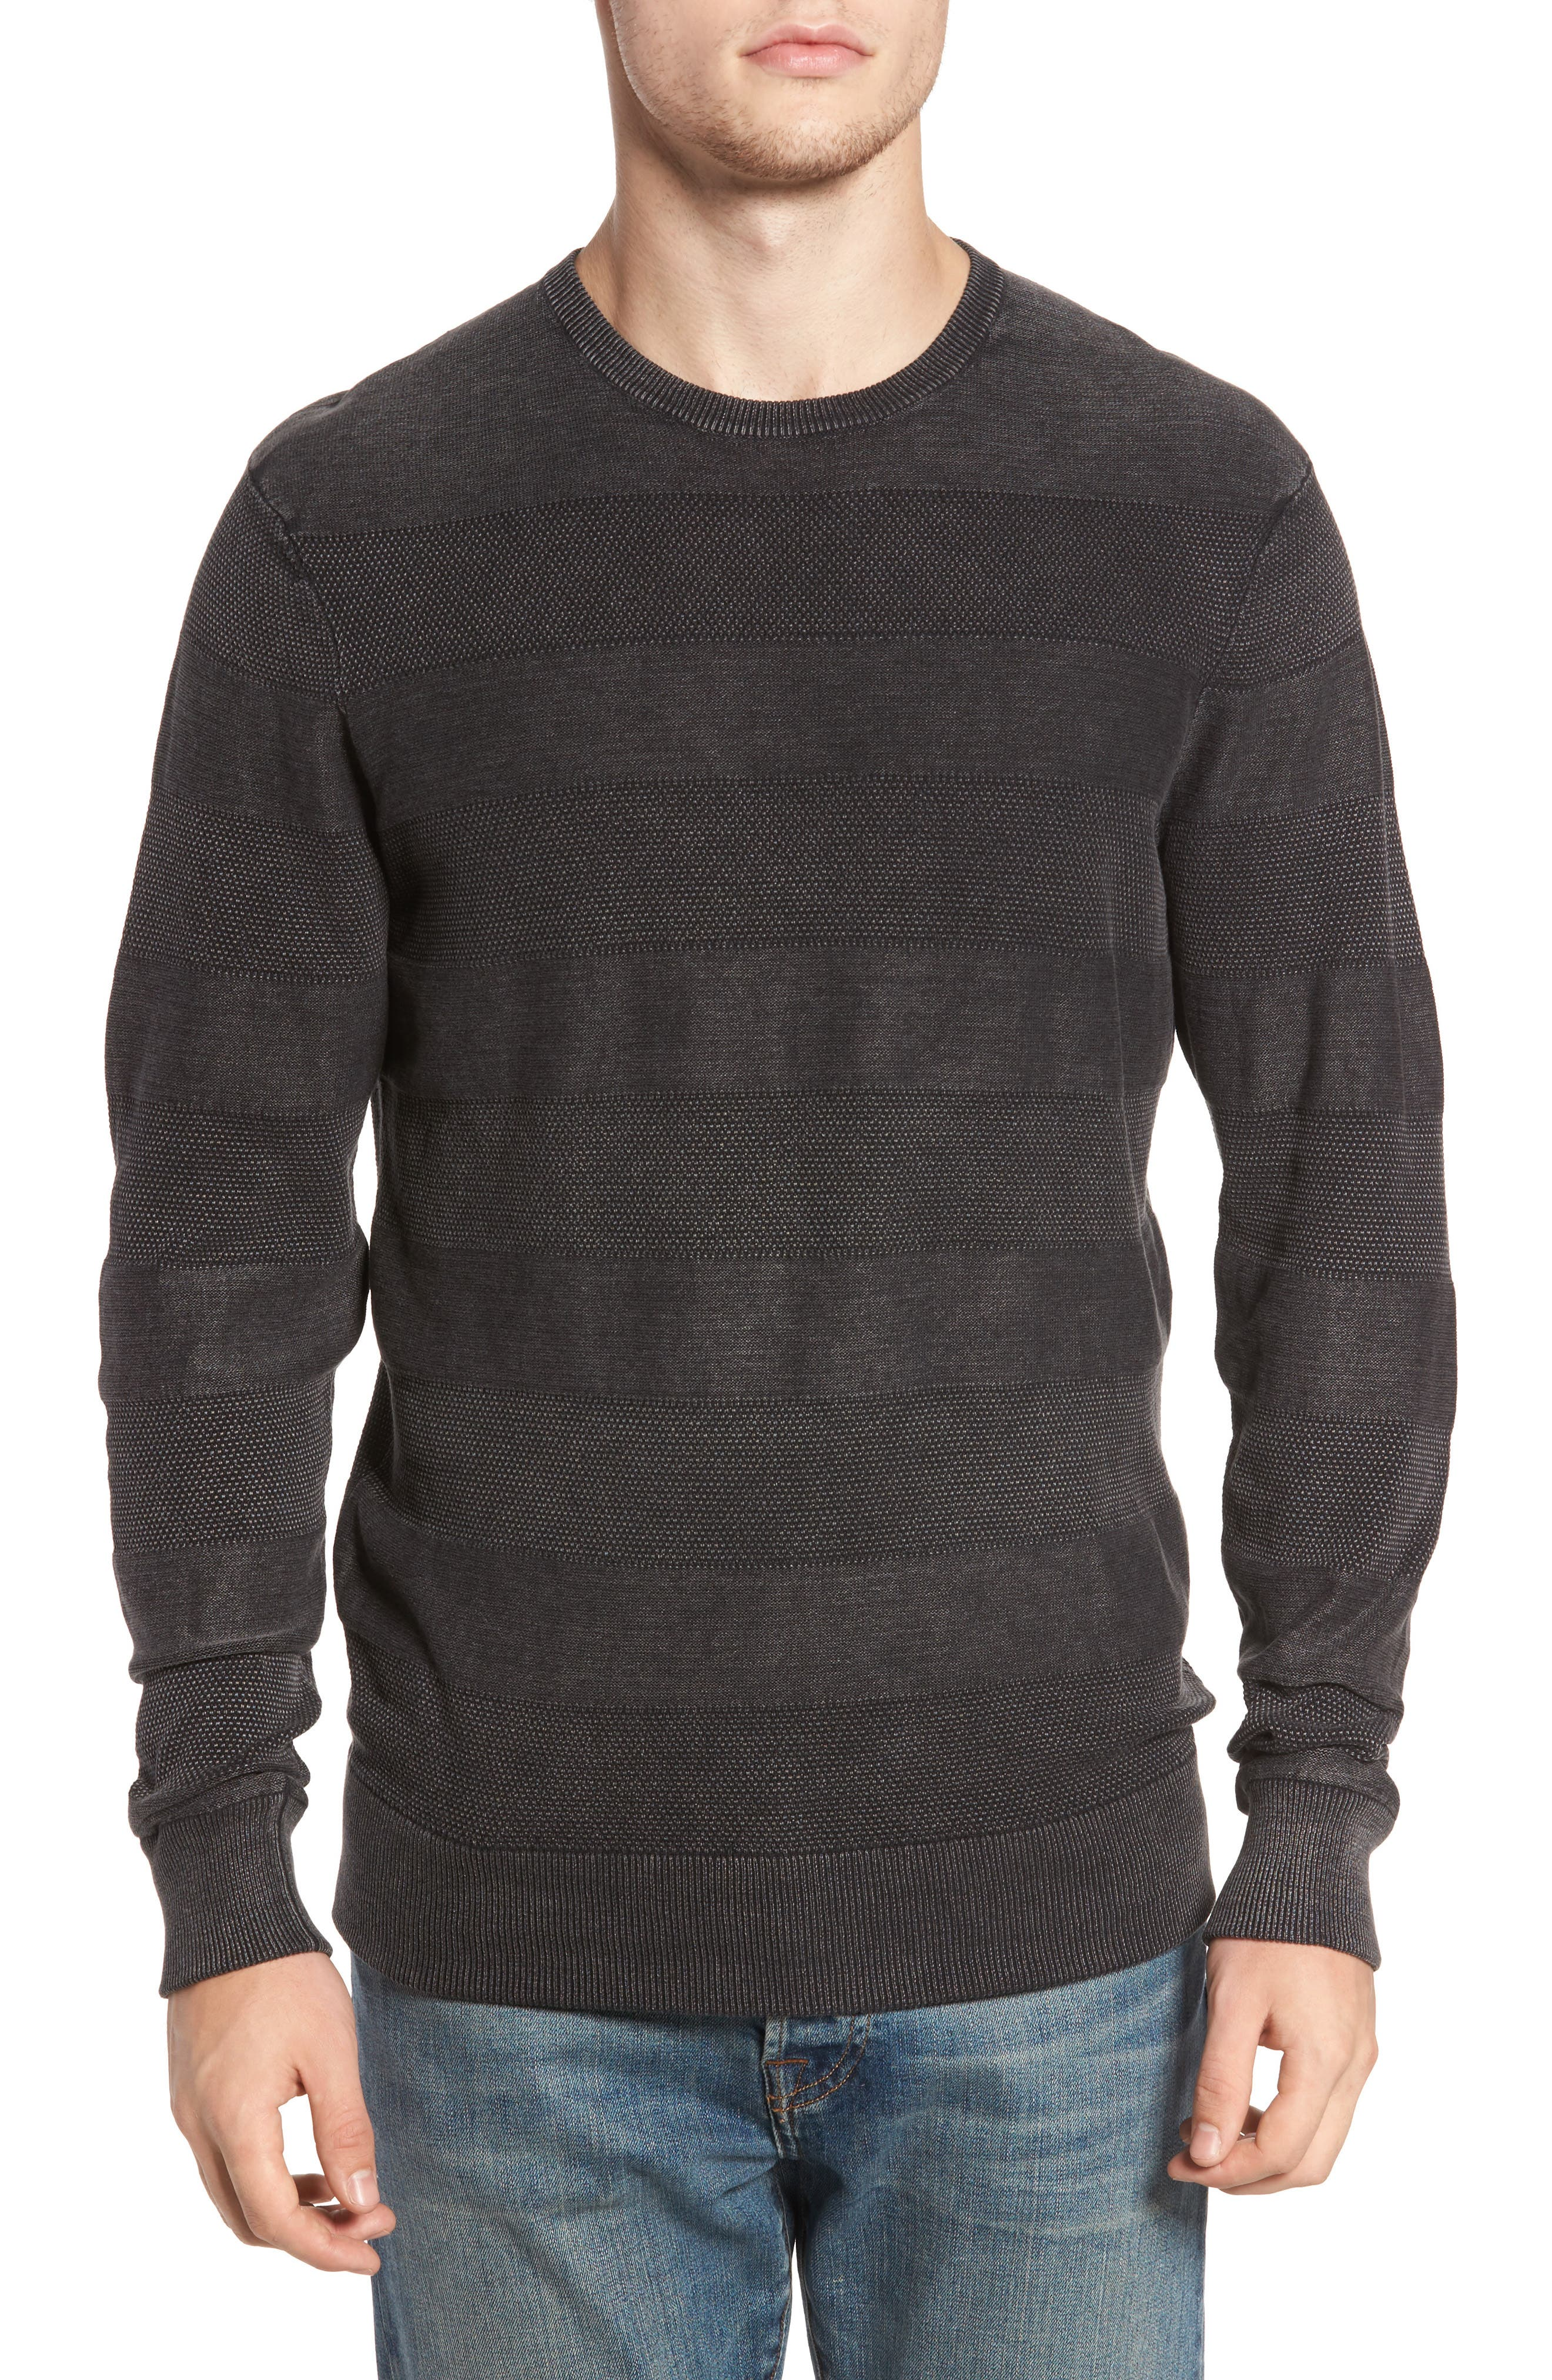 Main Image - 1901 Sunfaded Stripe Sweater